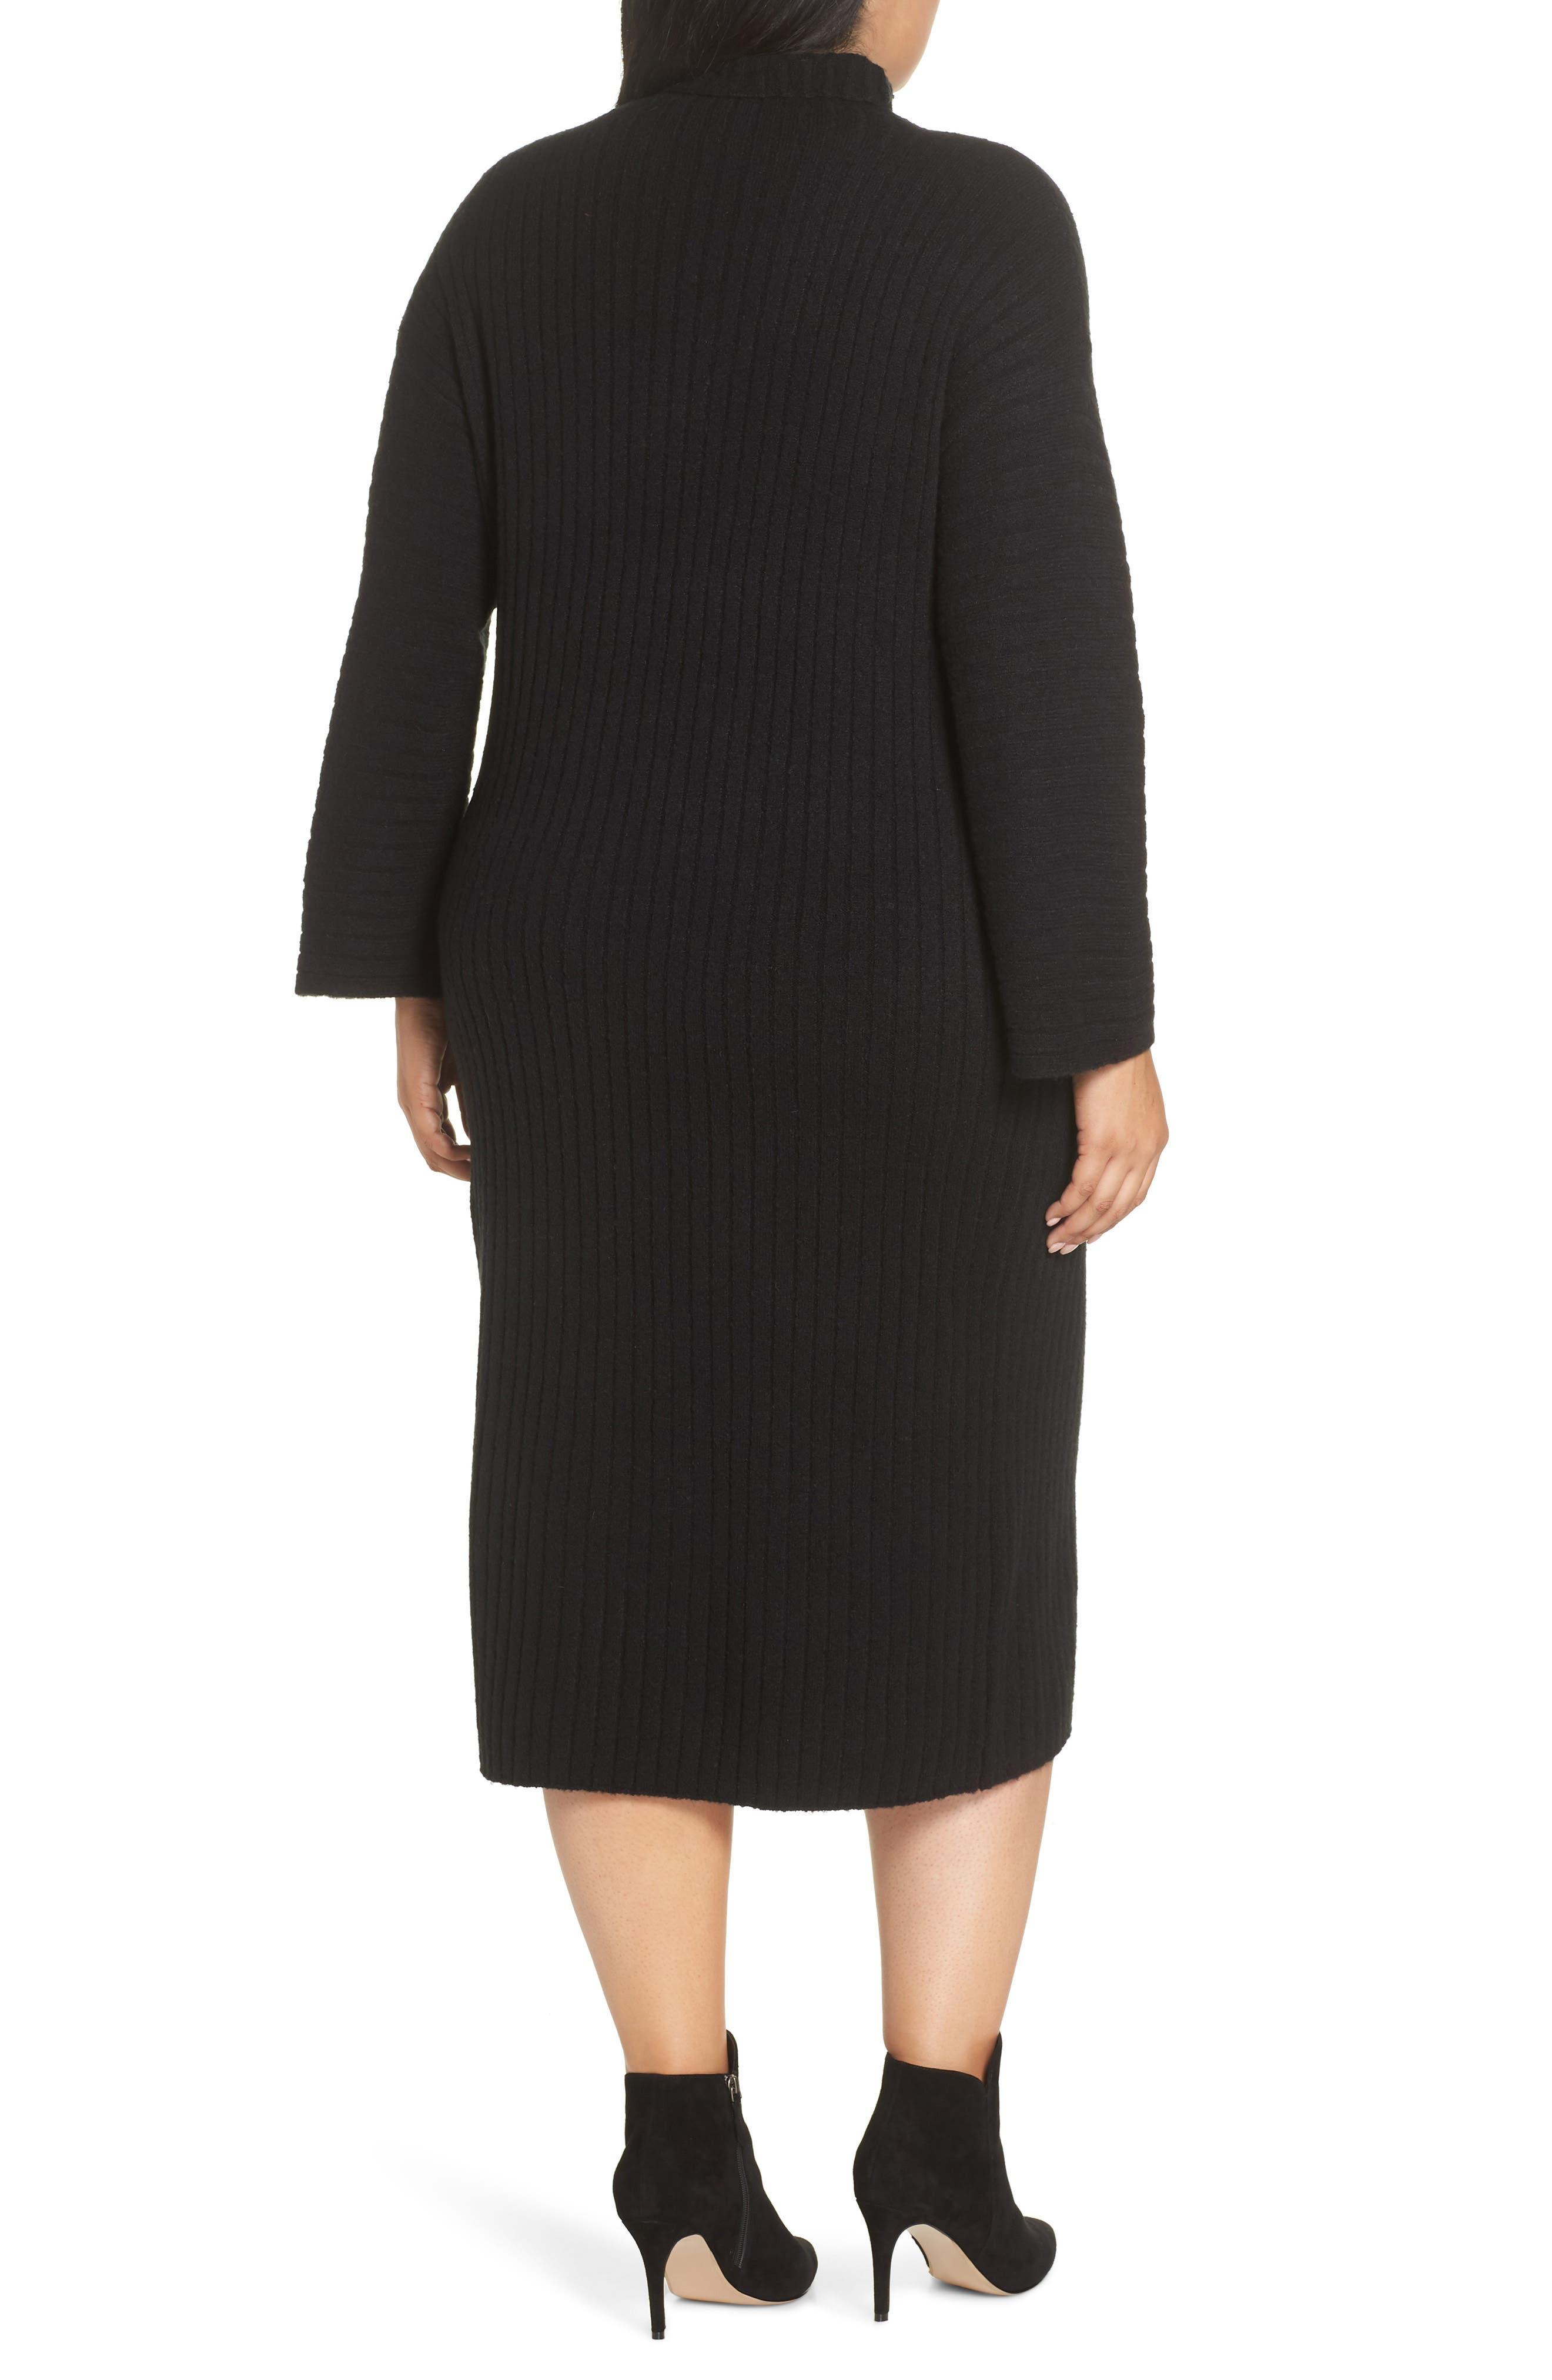 LEITH, Ribbed Midi Sweater Dress, Alternate thumbnail 2, color, BLACK